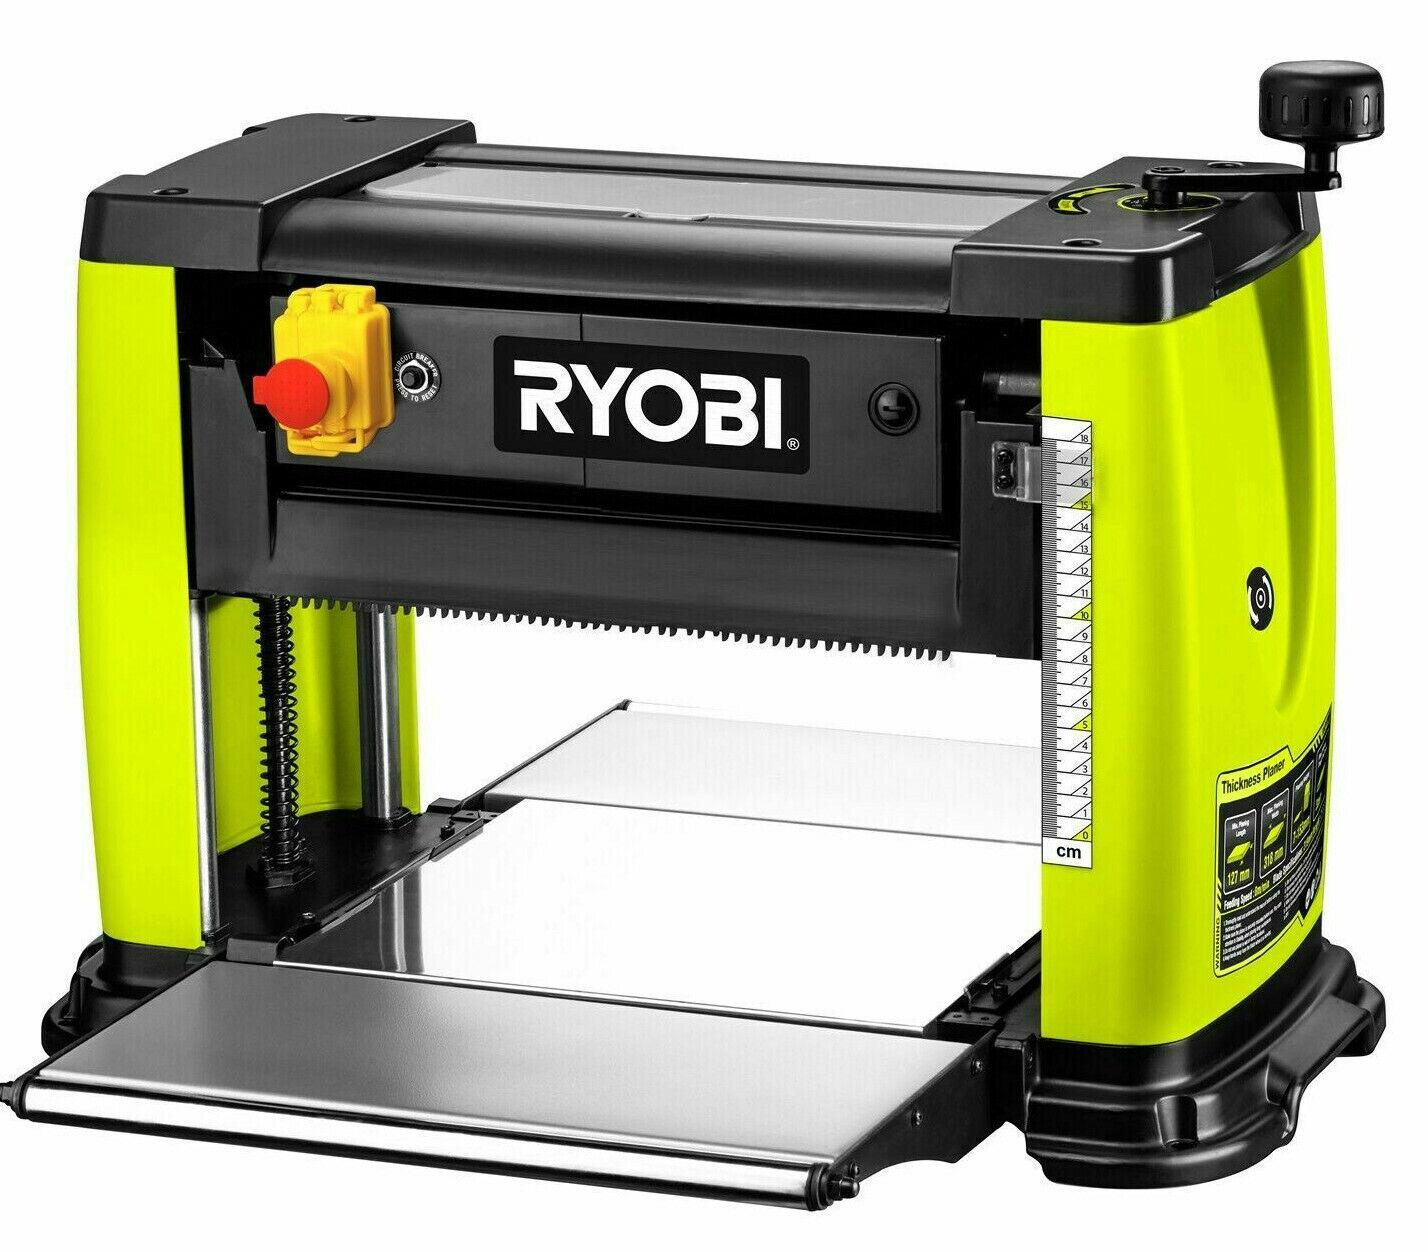 Replacement Drive Belt for RAP1500G Ryobi Bench Planer Thicknesser RAP-1500G B8F